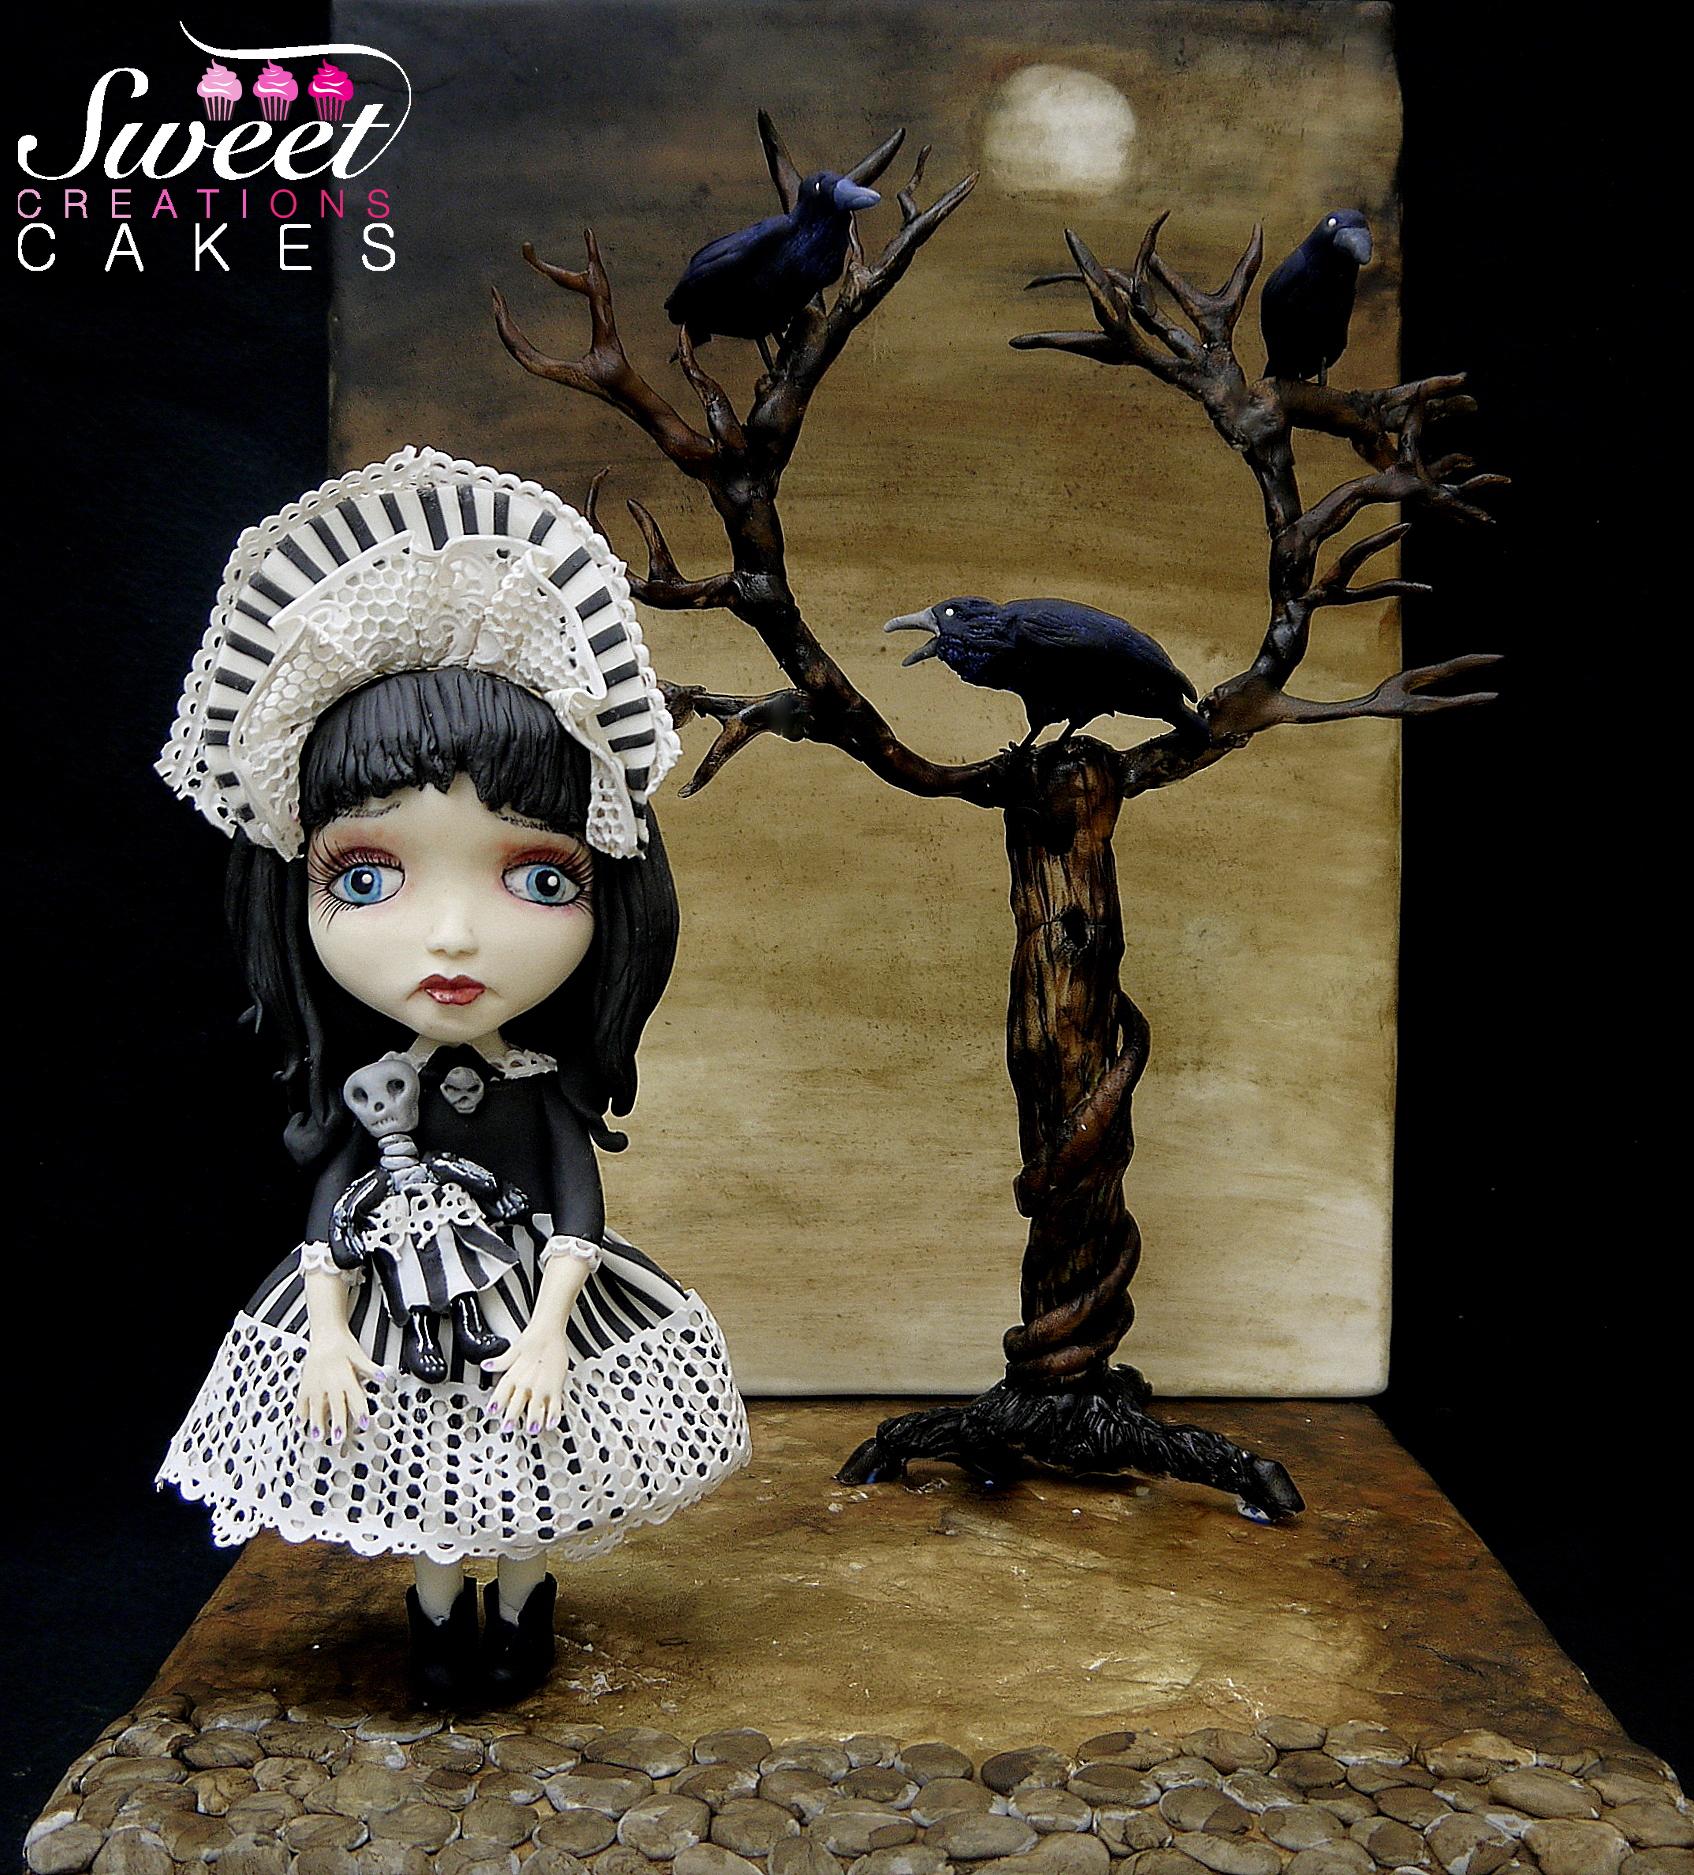 Creepy sculpted victorian doll